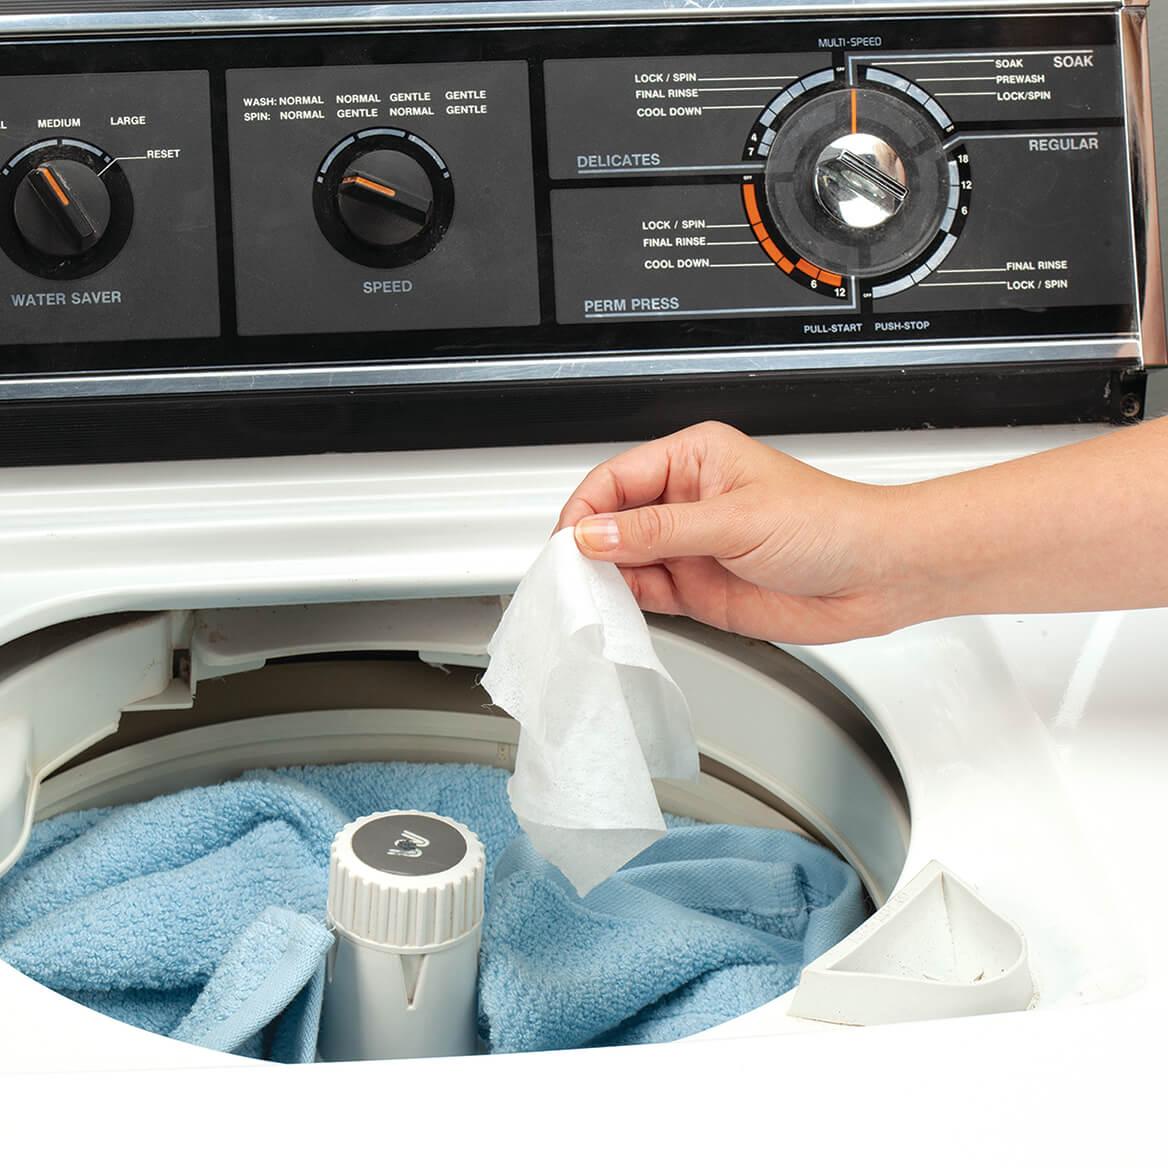 Lavender Laundry Detergent Sheets 130 loads-371064